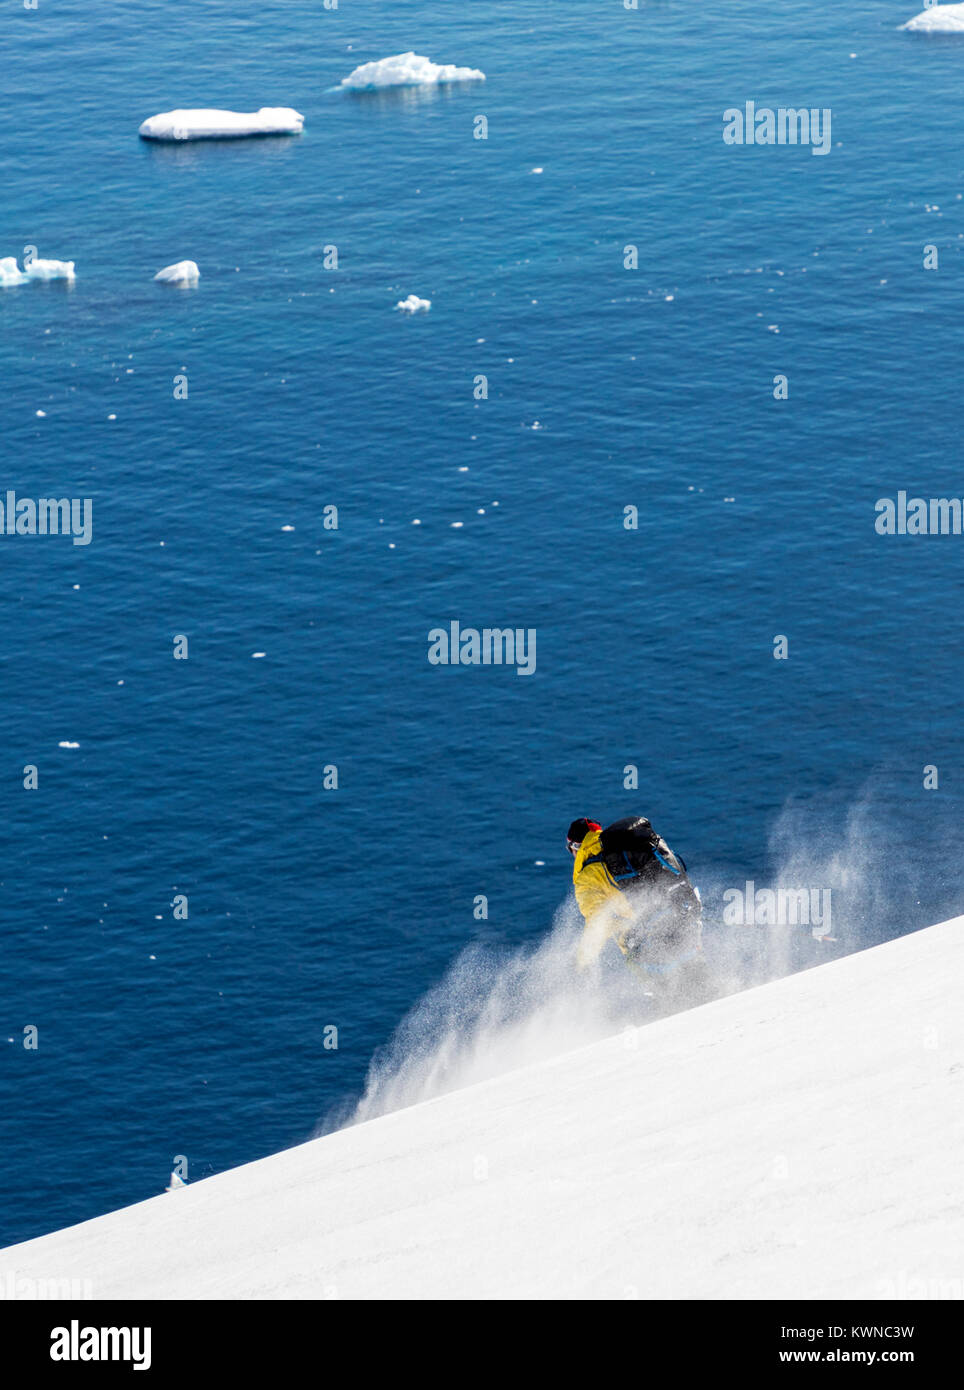 Alpine ski mountaineer guide skiing downhill in Antarctica; Rongé Island; Arctowski Peninsula - Stock Image